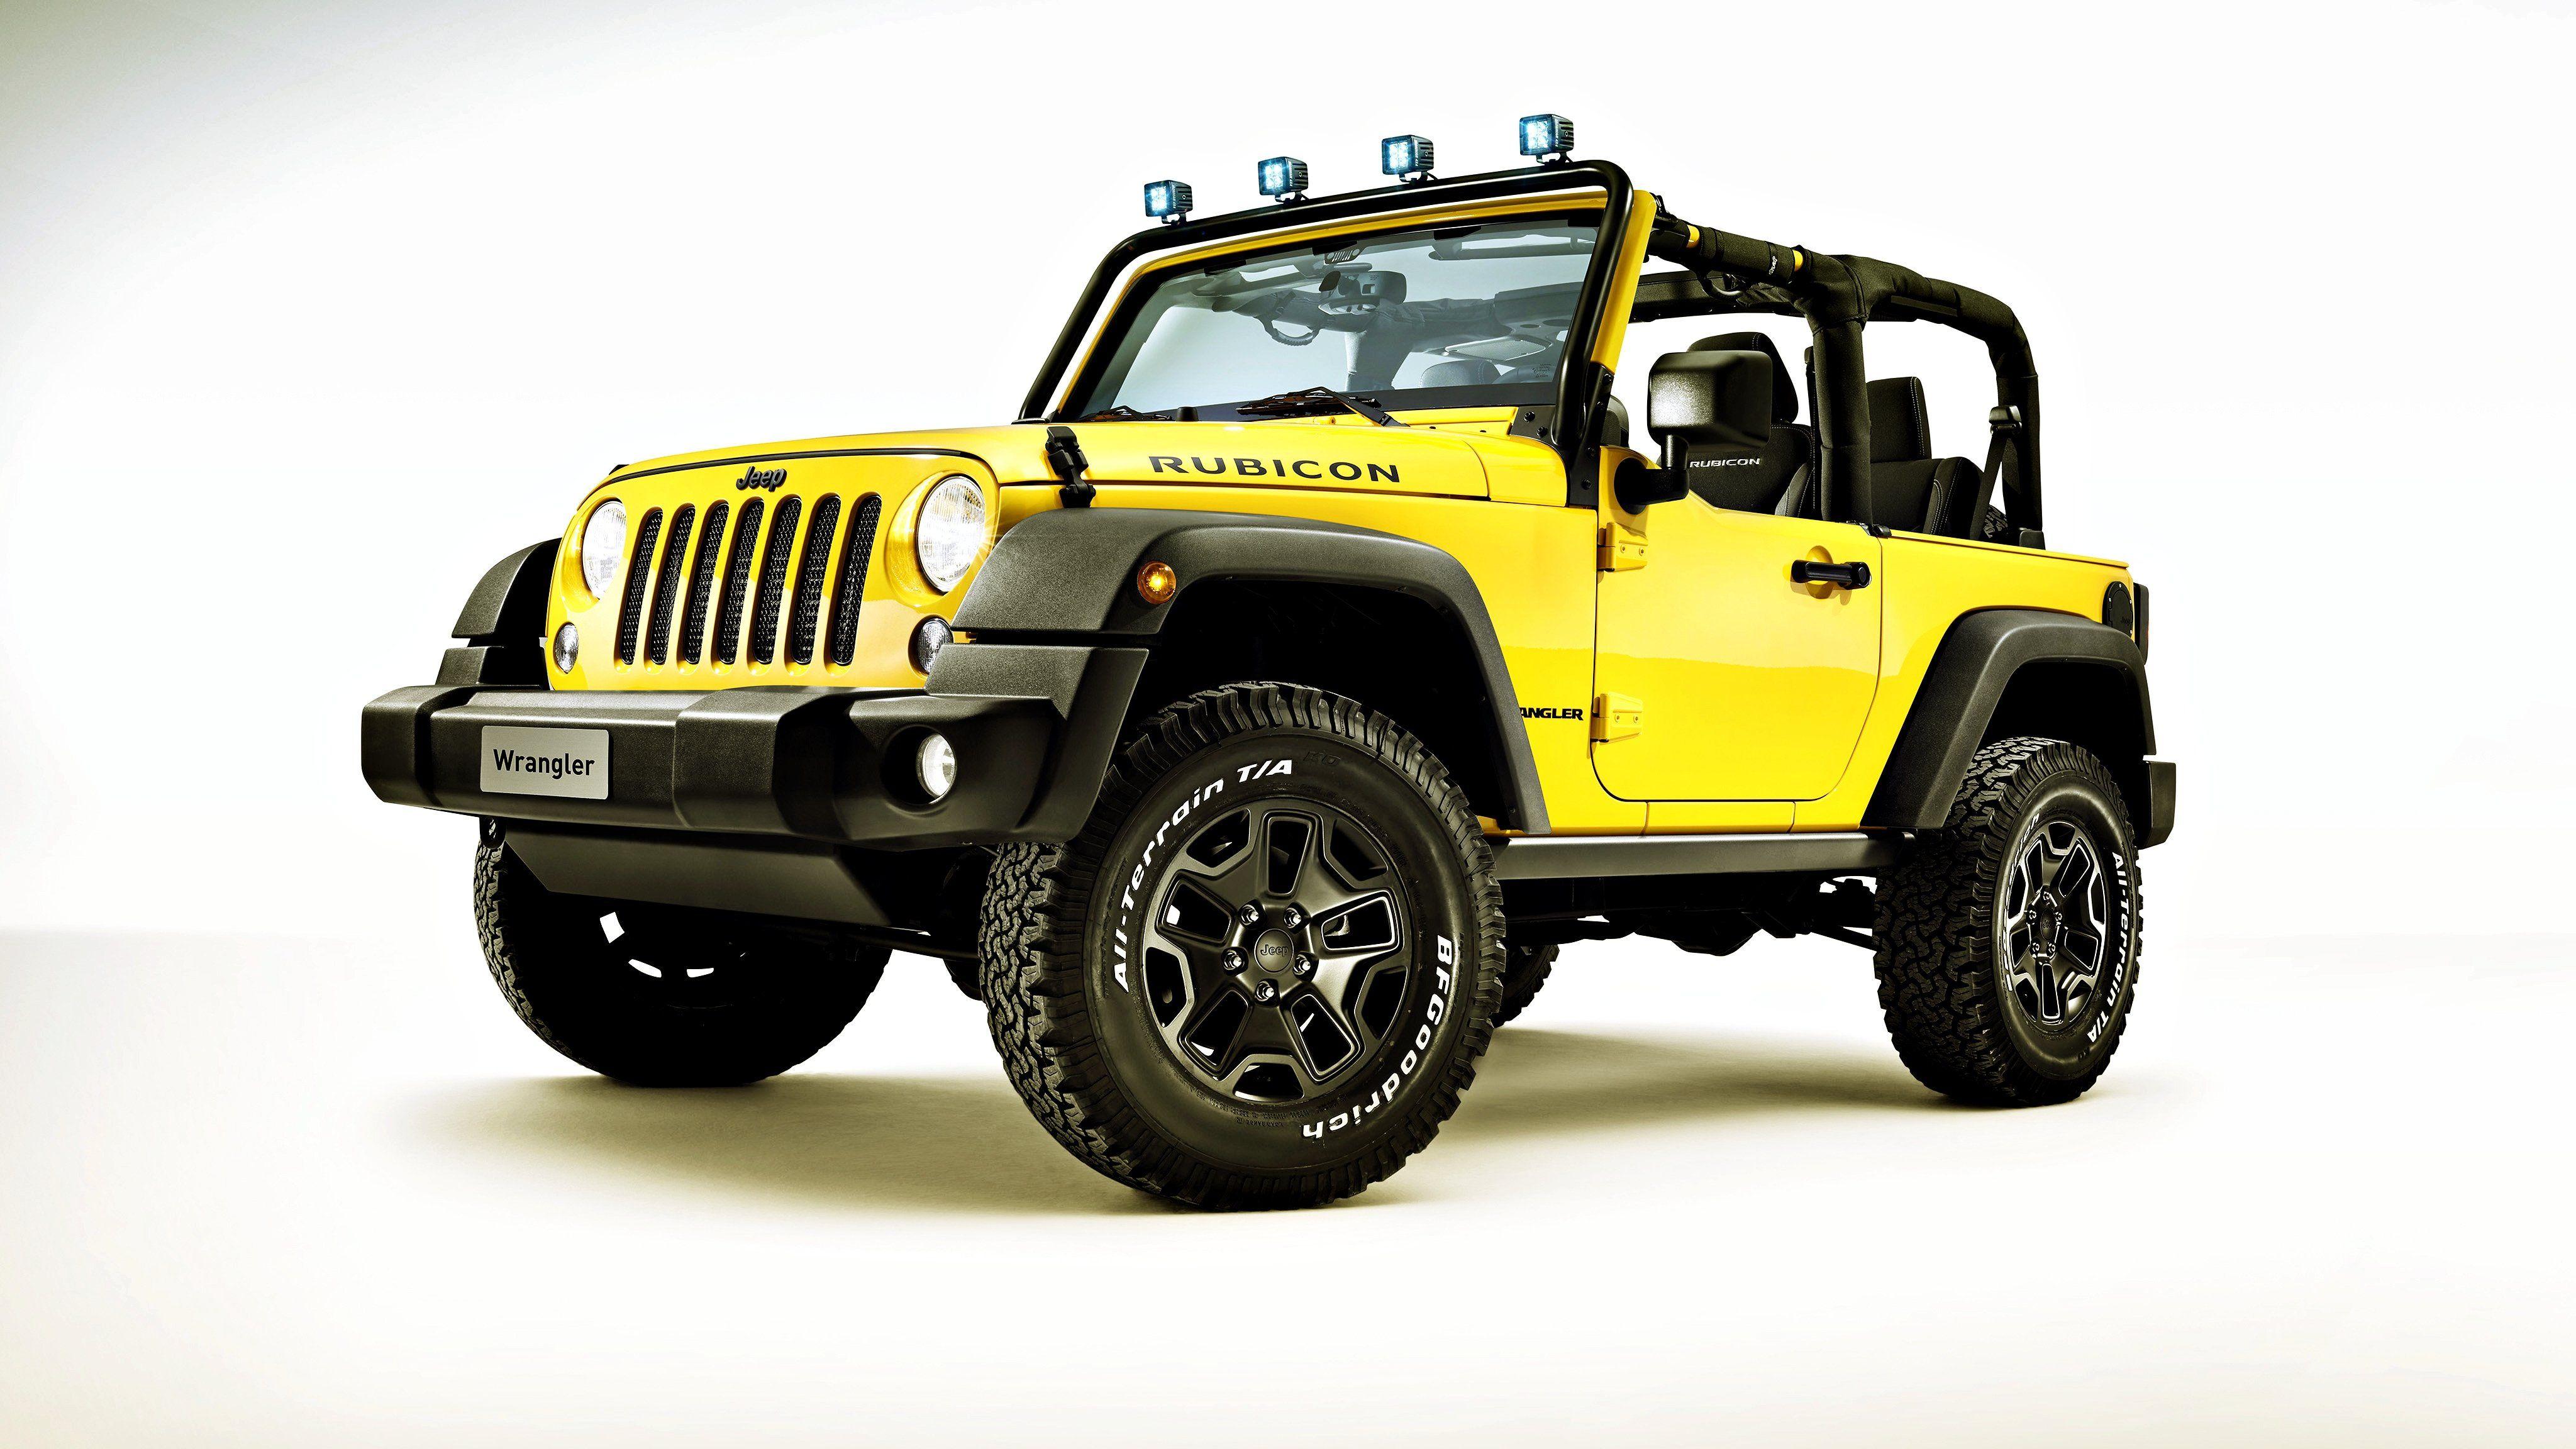 2015 Jeep Wrangler Rubicon Star Rocks jeep Wrangler yellow